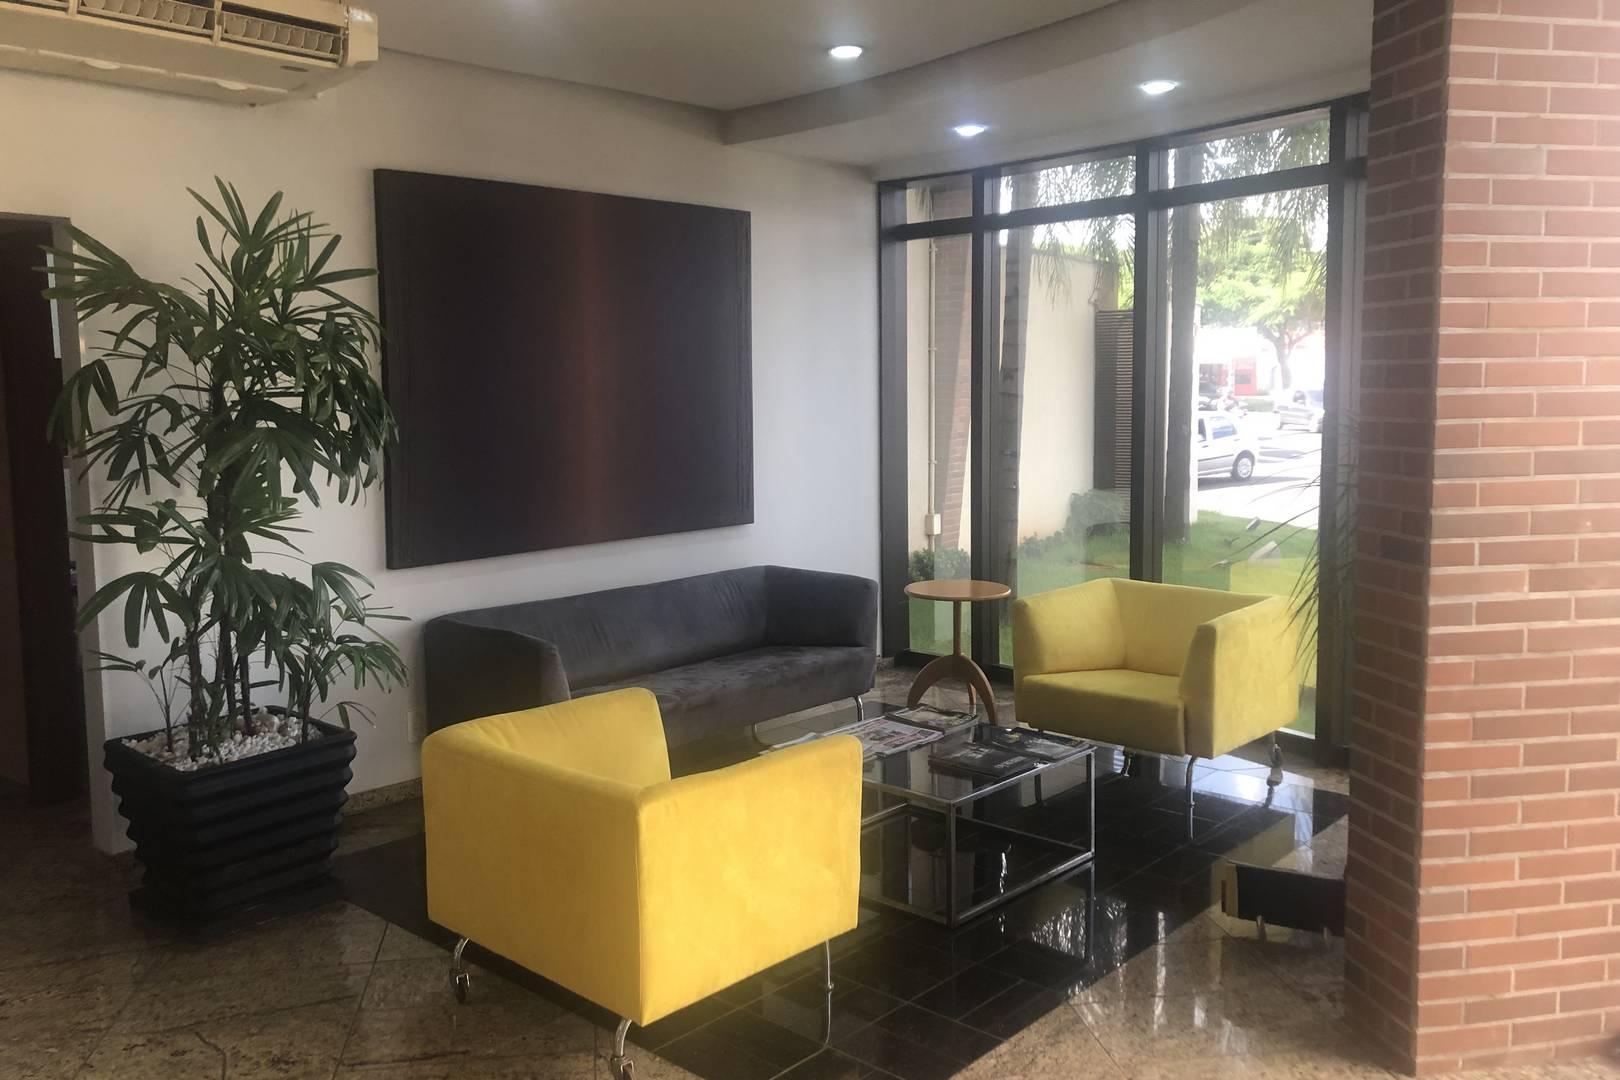 http://hotelcanadarp.com.br/wp-content/uploads/2019/01/hotel-canada-recepcao.jpg